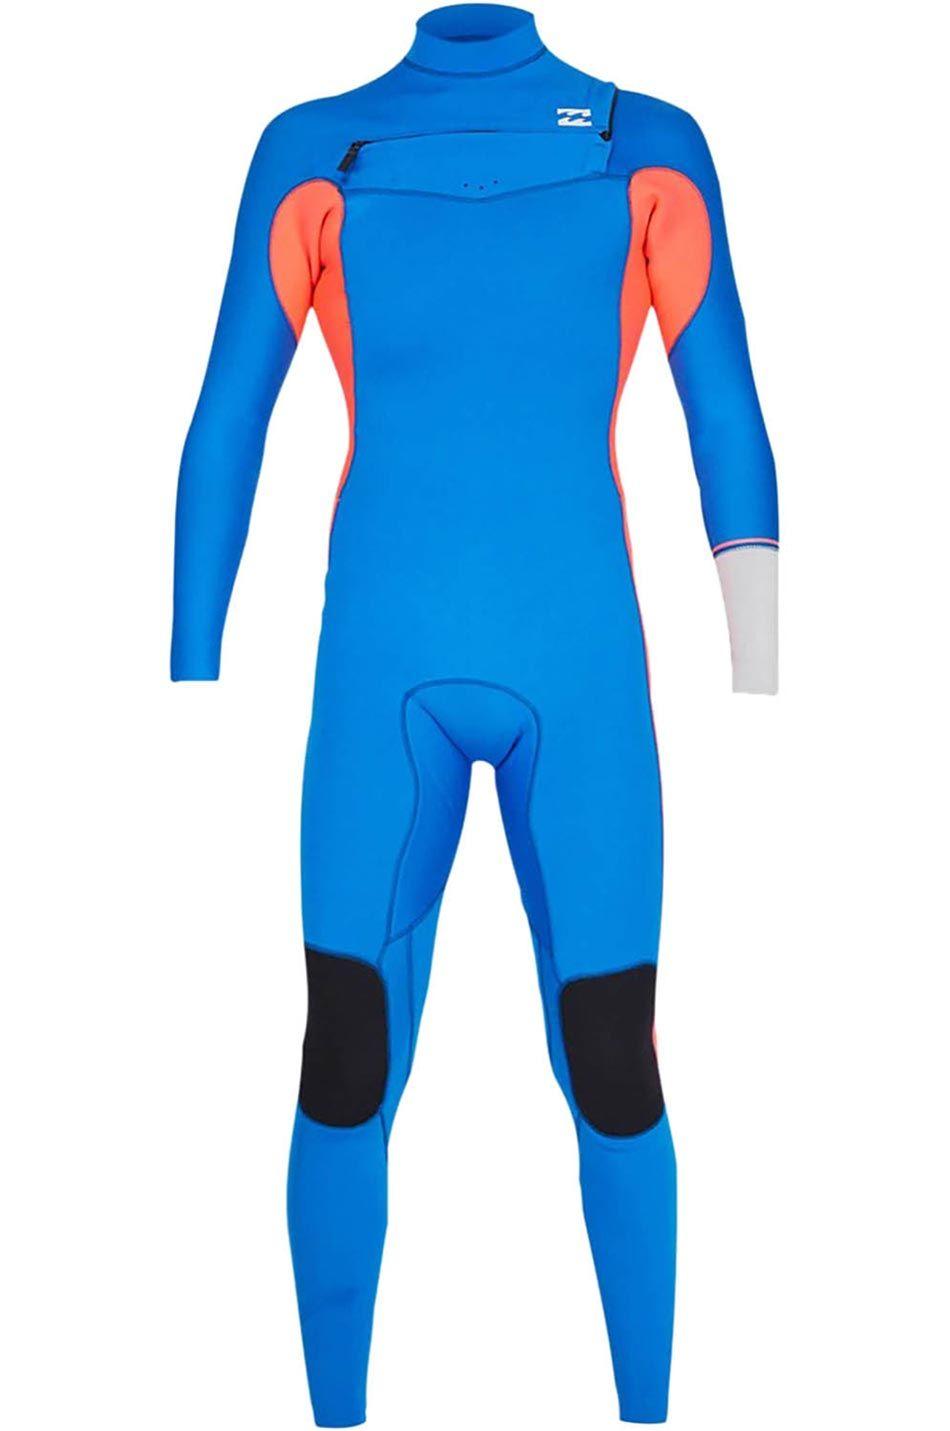 Billabong Wetsuit 302 REVOLUTION LTD CZ Ice 3x2mm